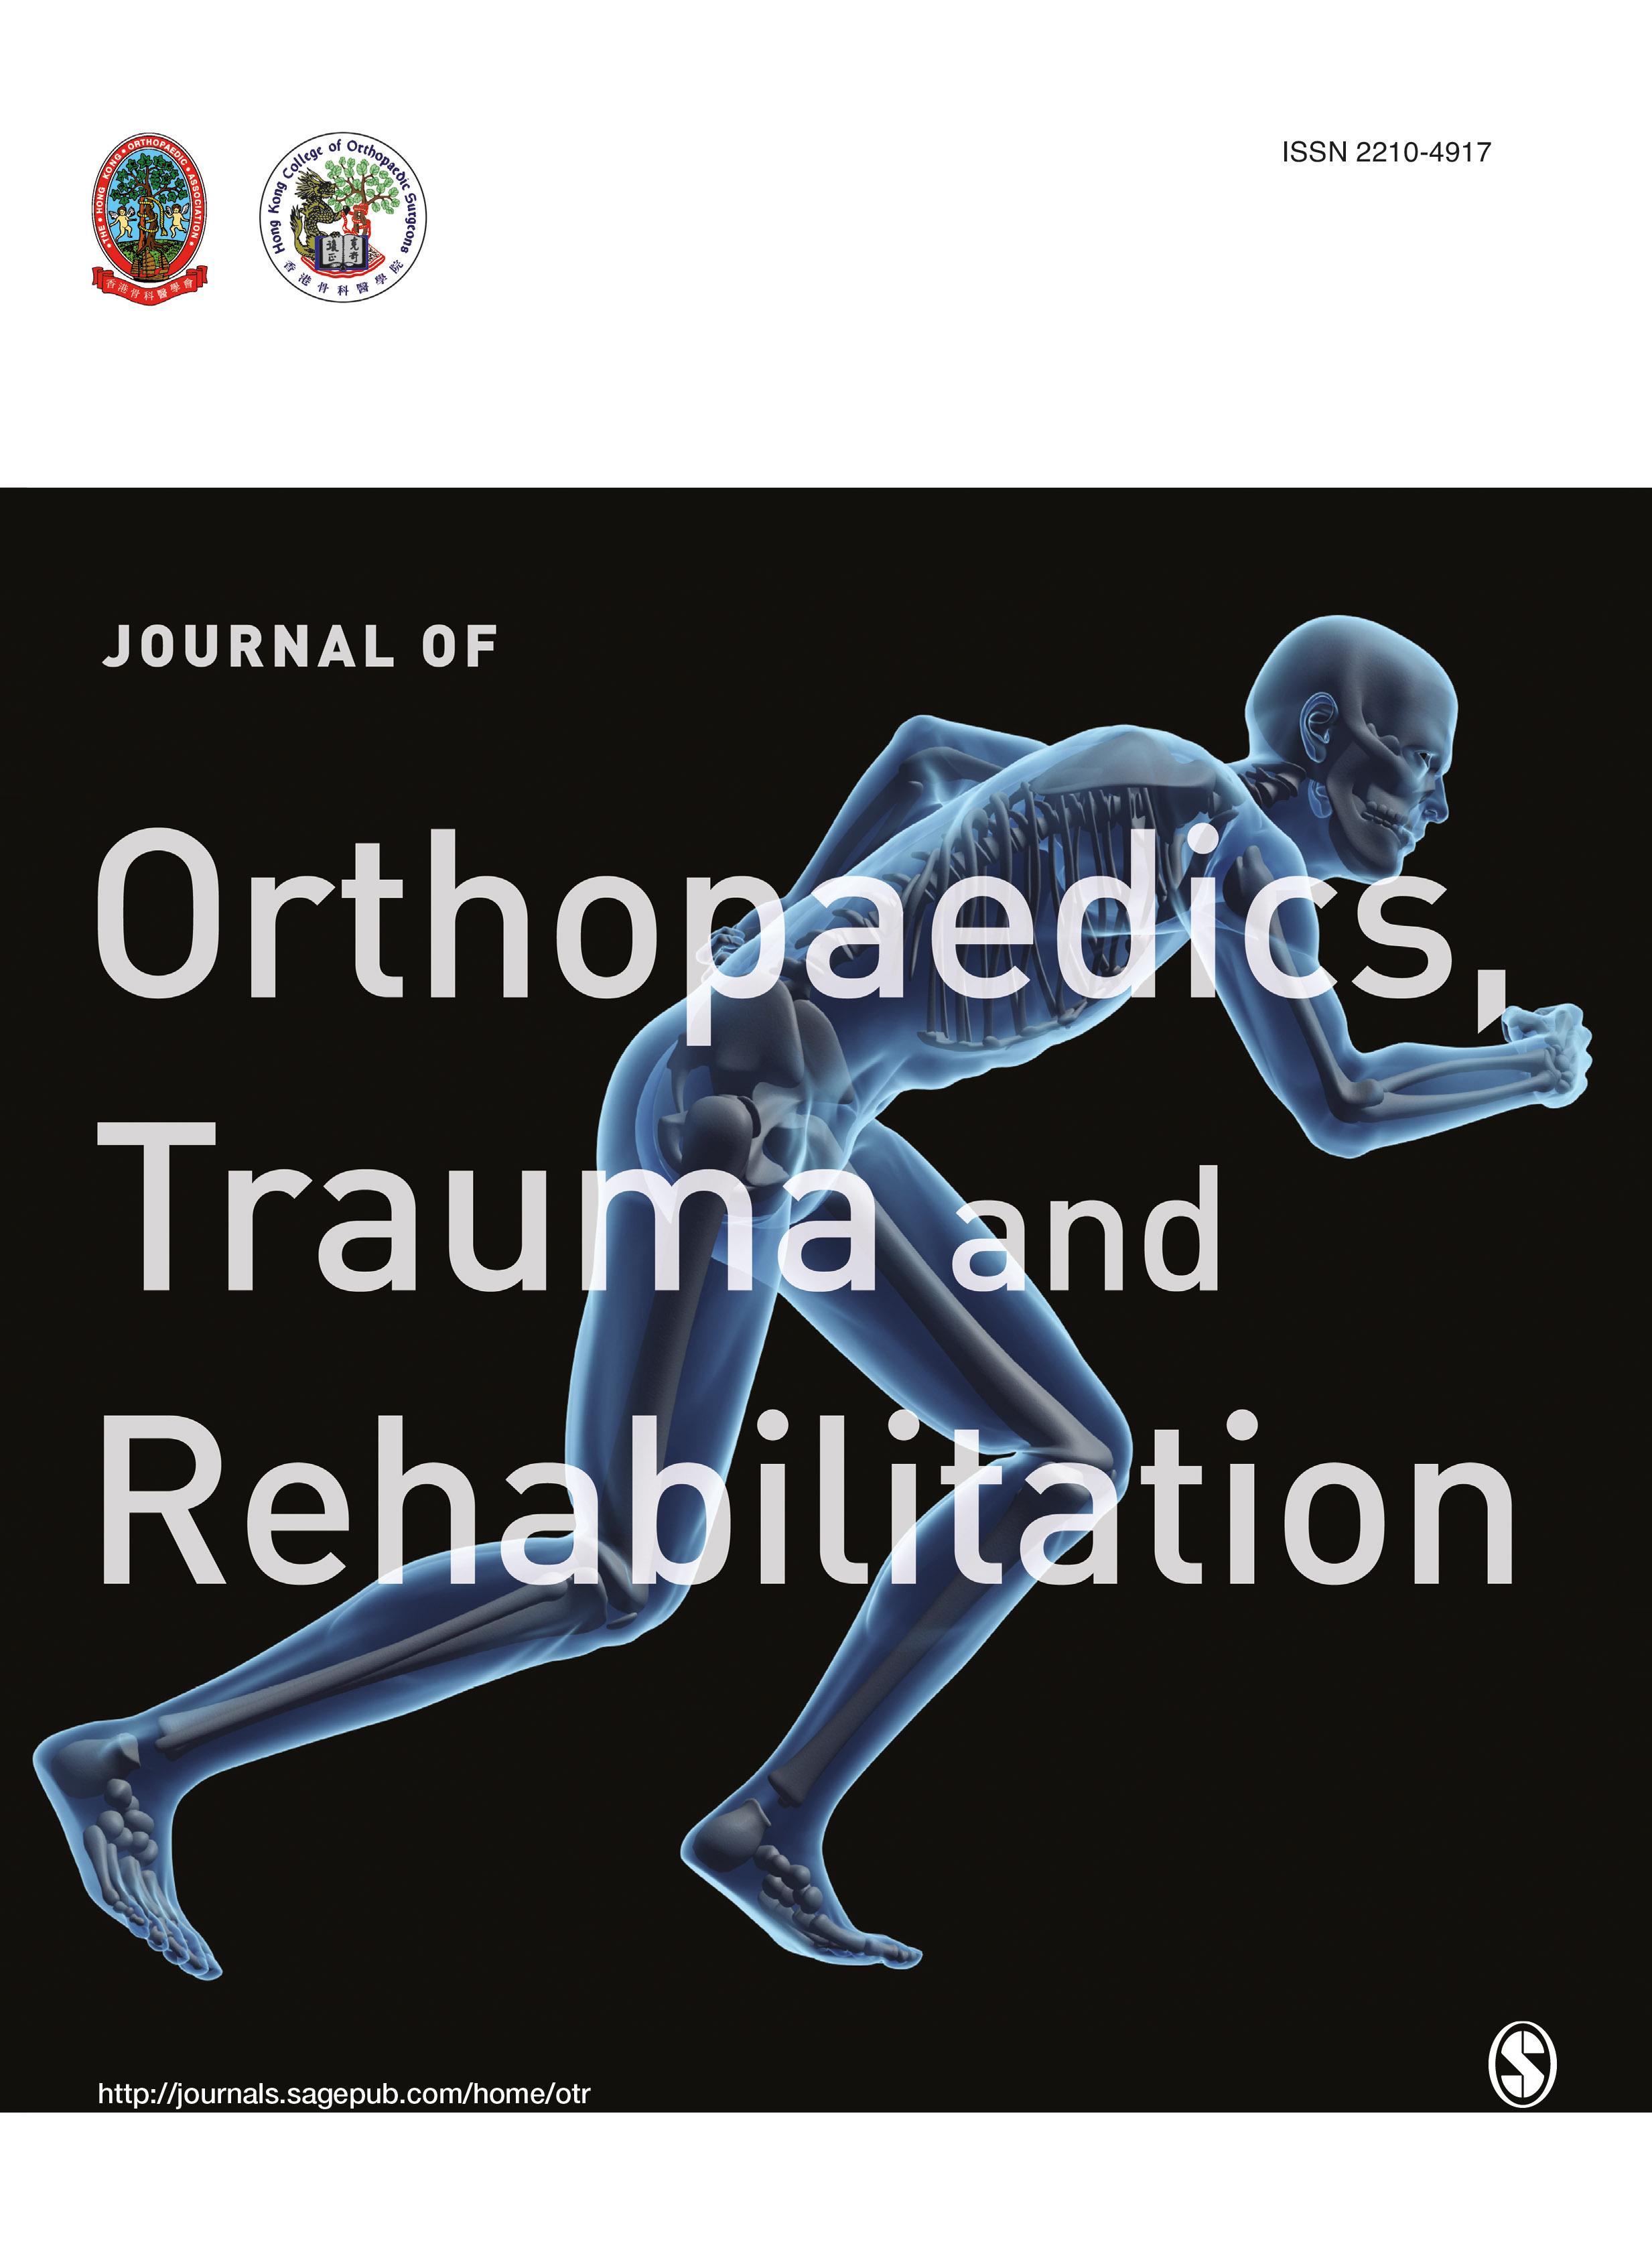 Journal of Orthopaedics, Trauma and Rehabilitation